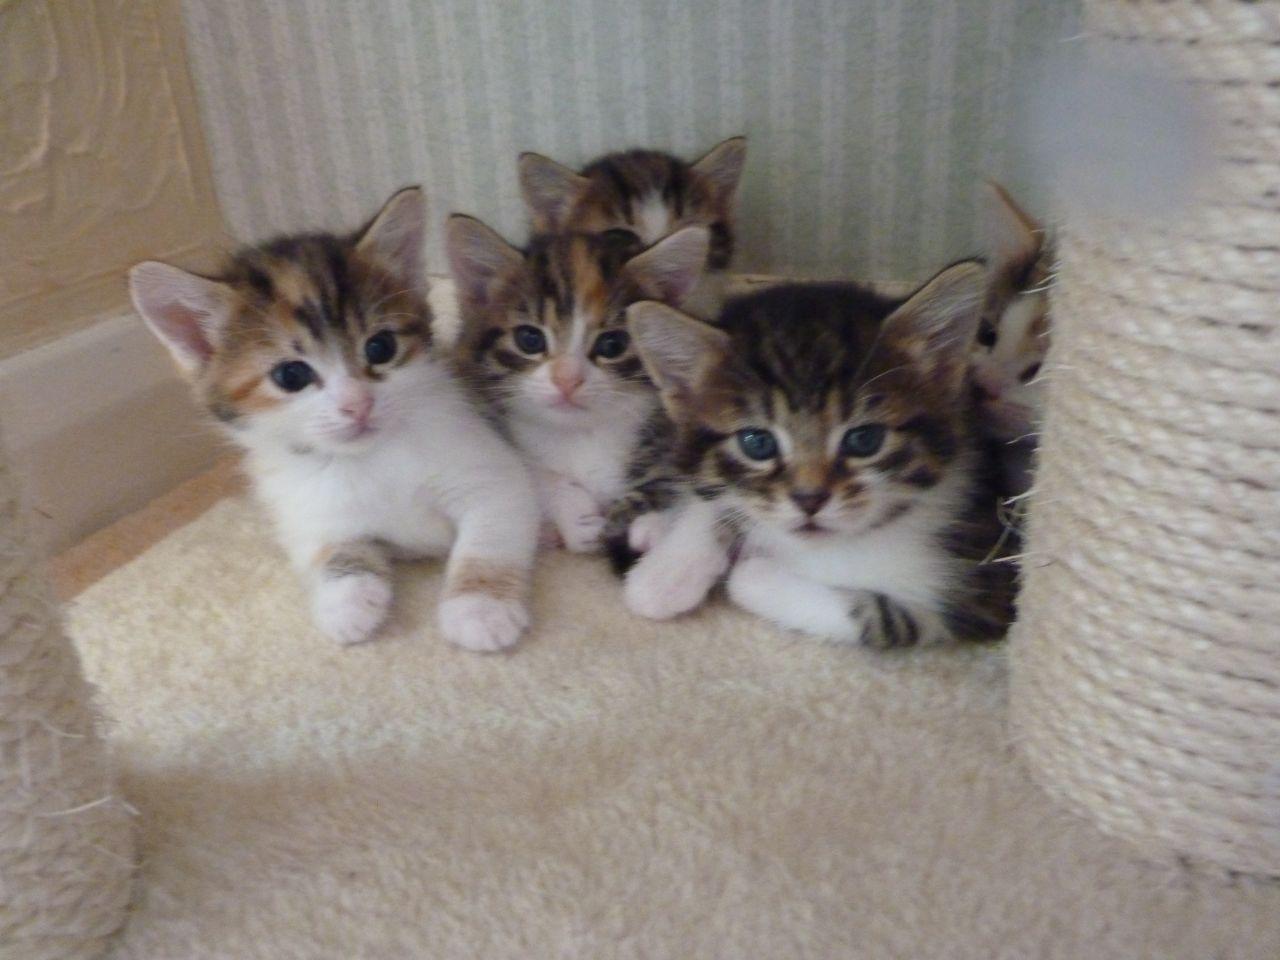 Adorable Kittens For Sale Kittens Cutest Kitten For Sale Beautiful Kittens